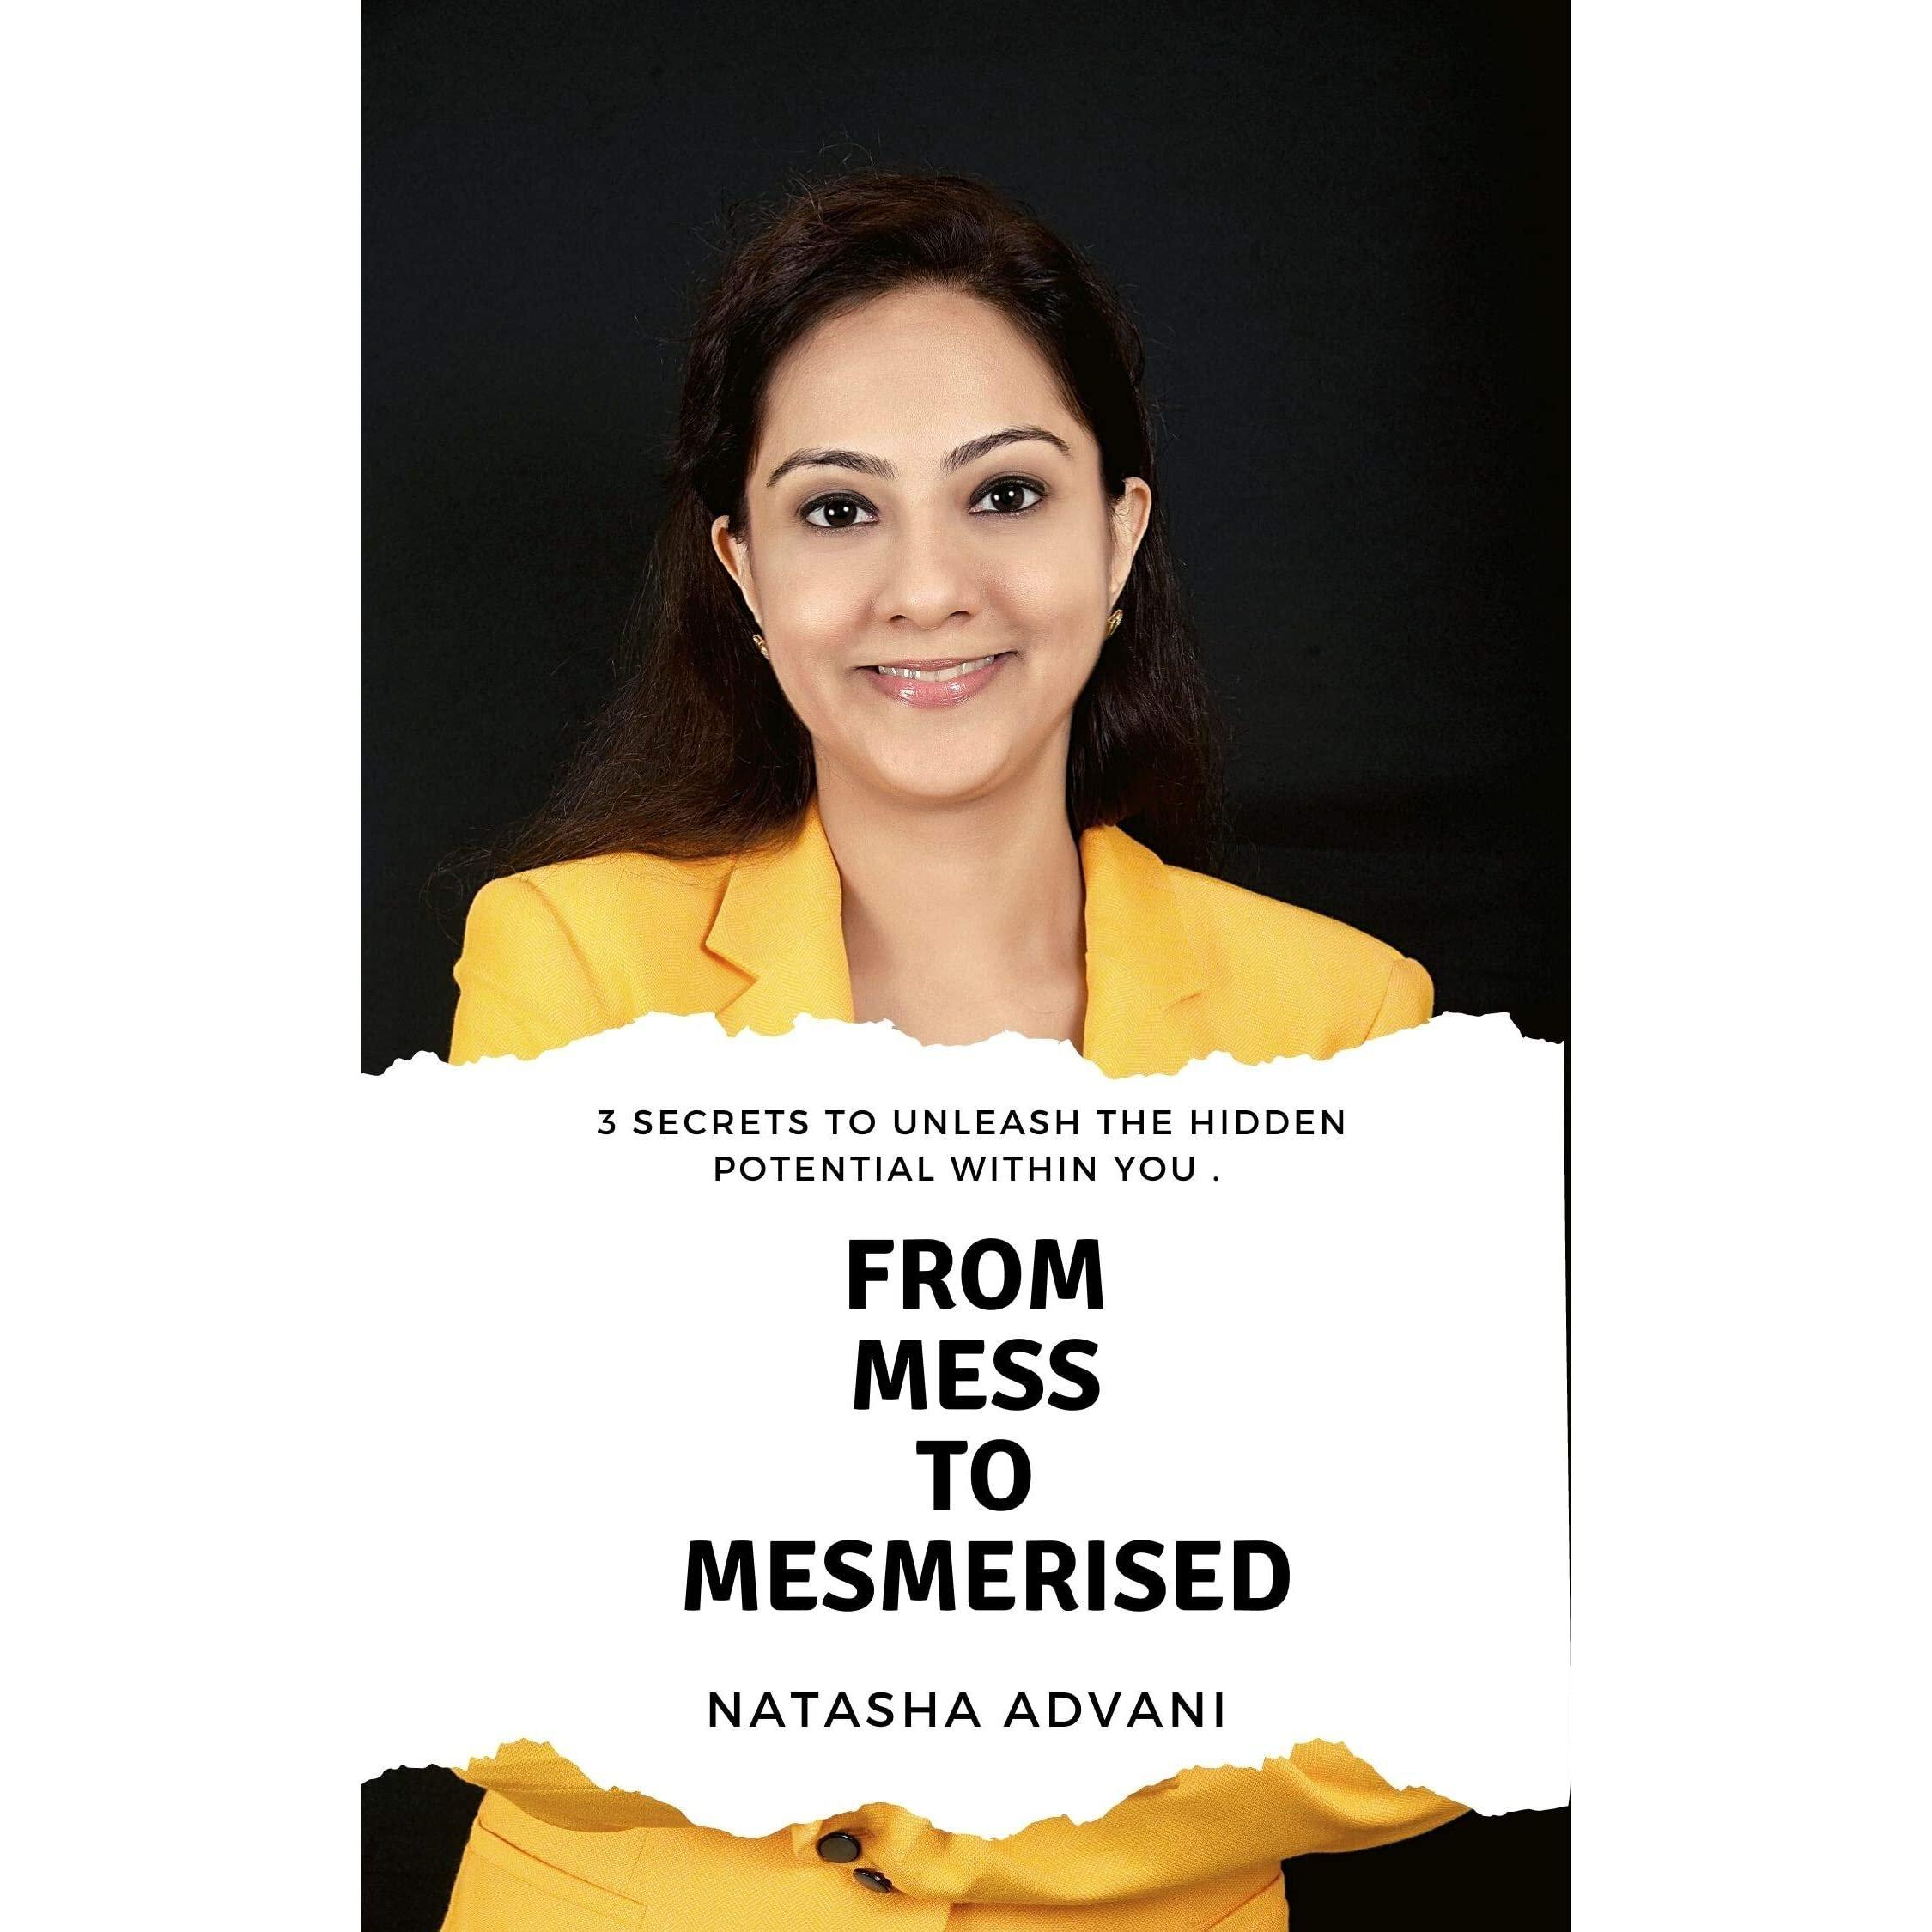 From mess to mesmerised by natasha advani